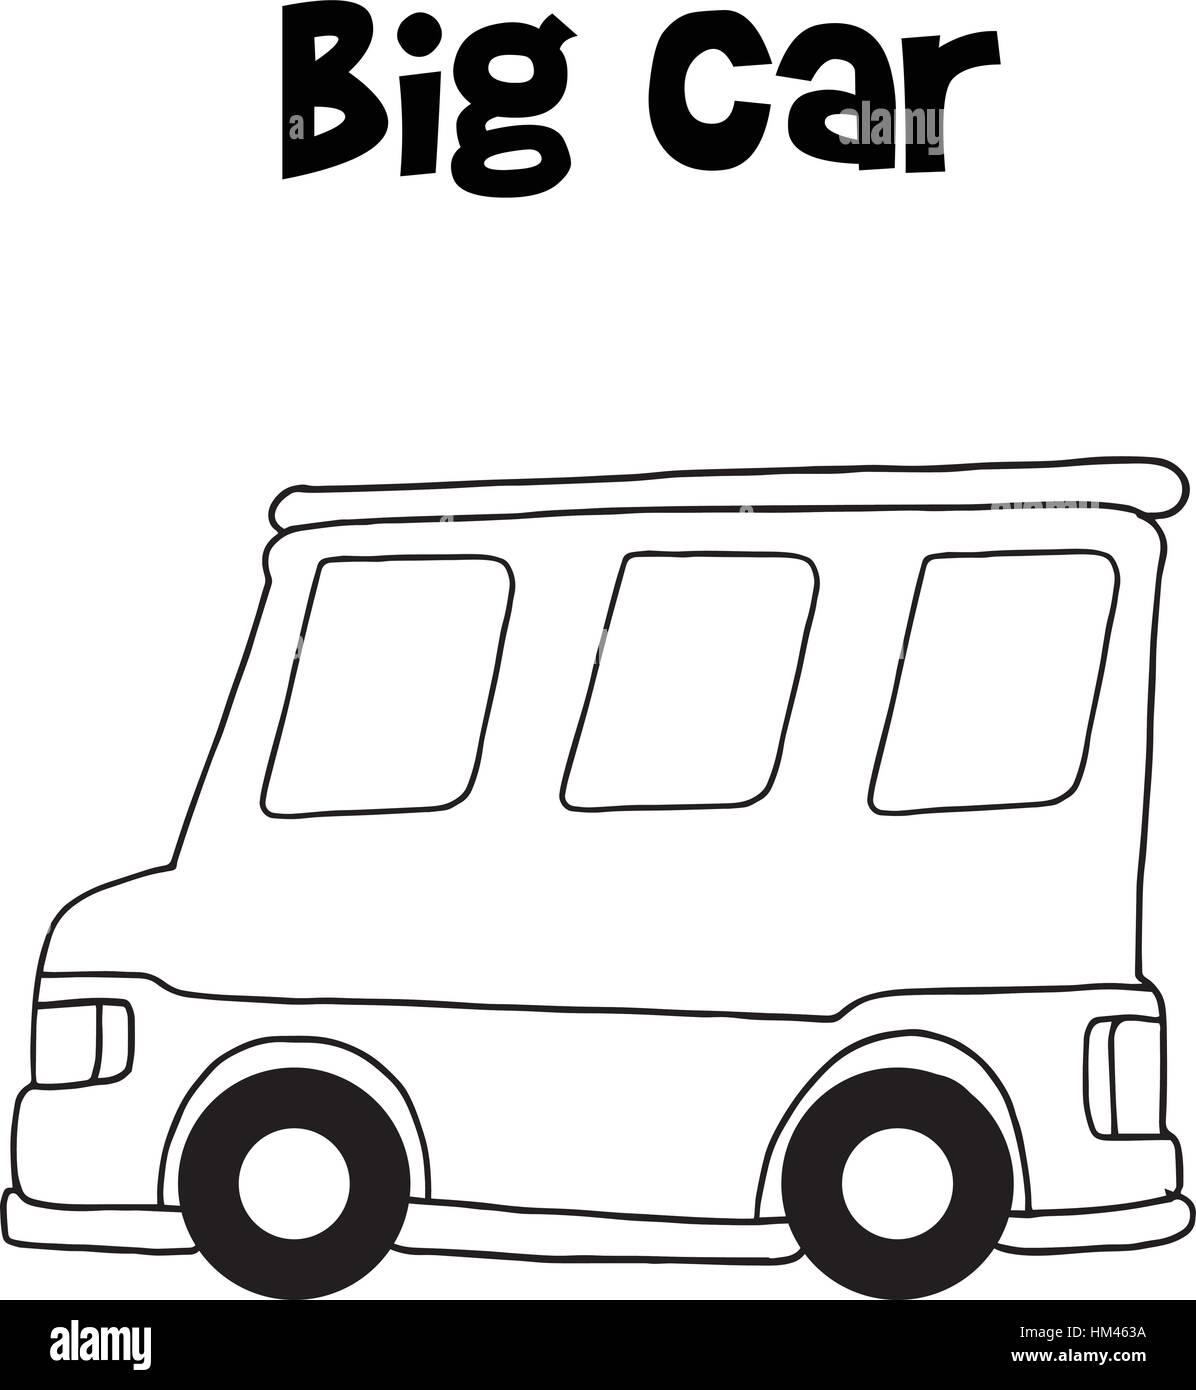 Big car of hand draw - Stock Image